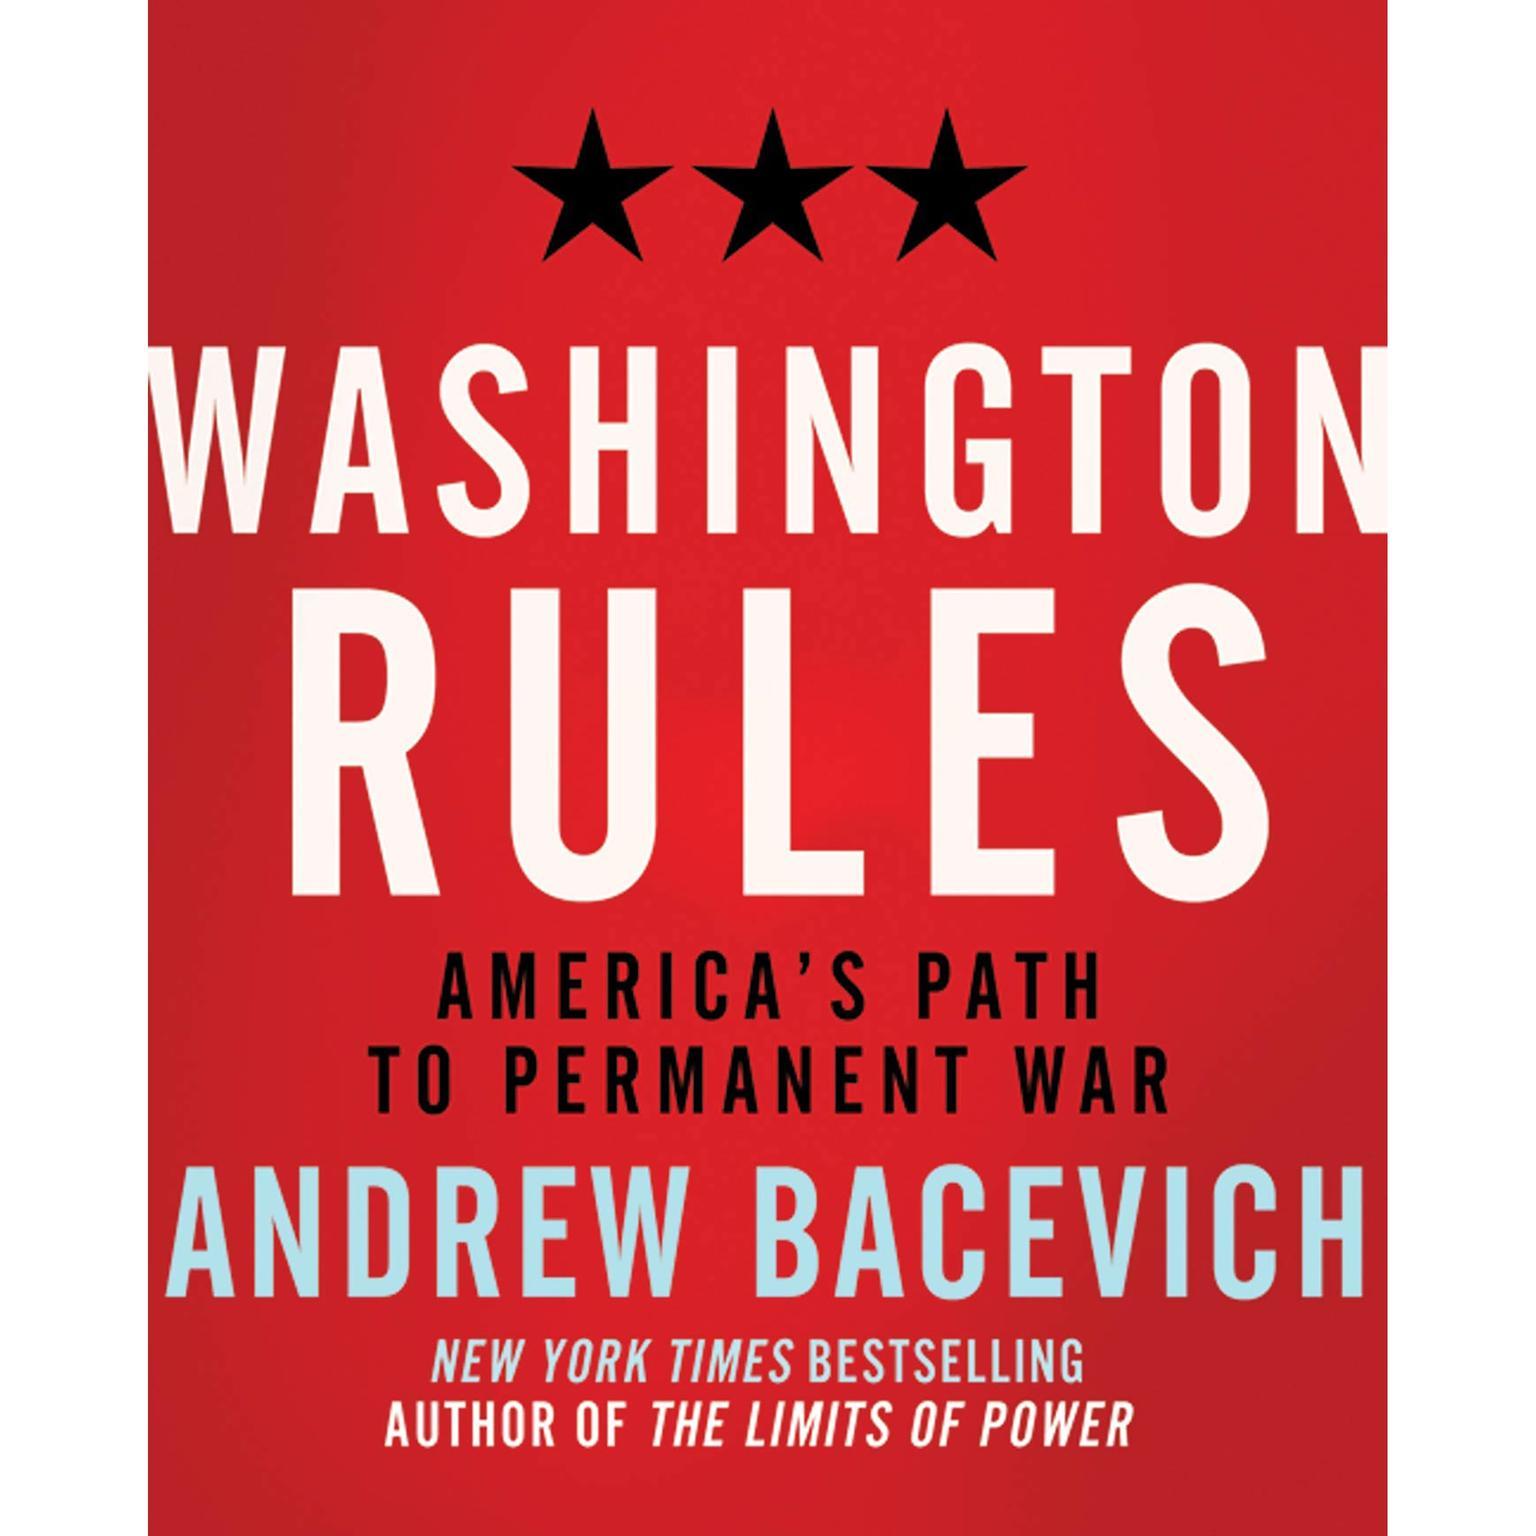 Printable Washington Rules: America's Path to Permanent War Audiobook Cover Art